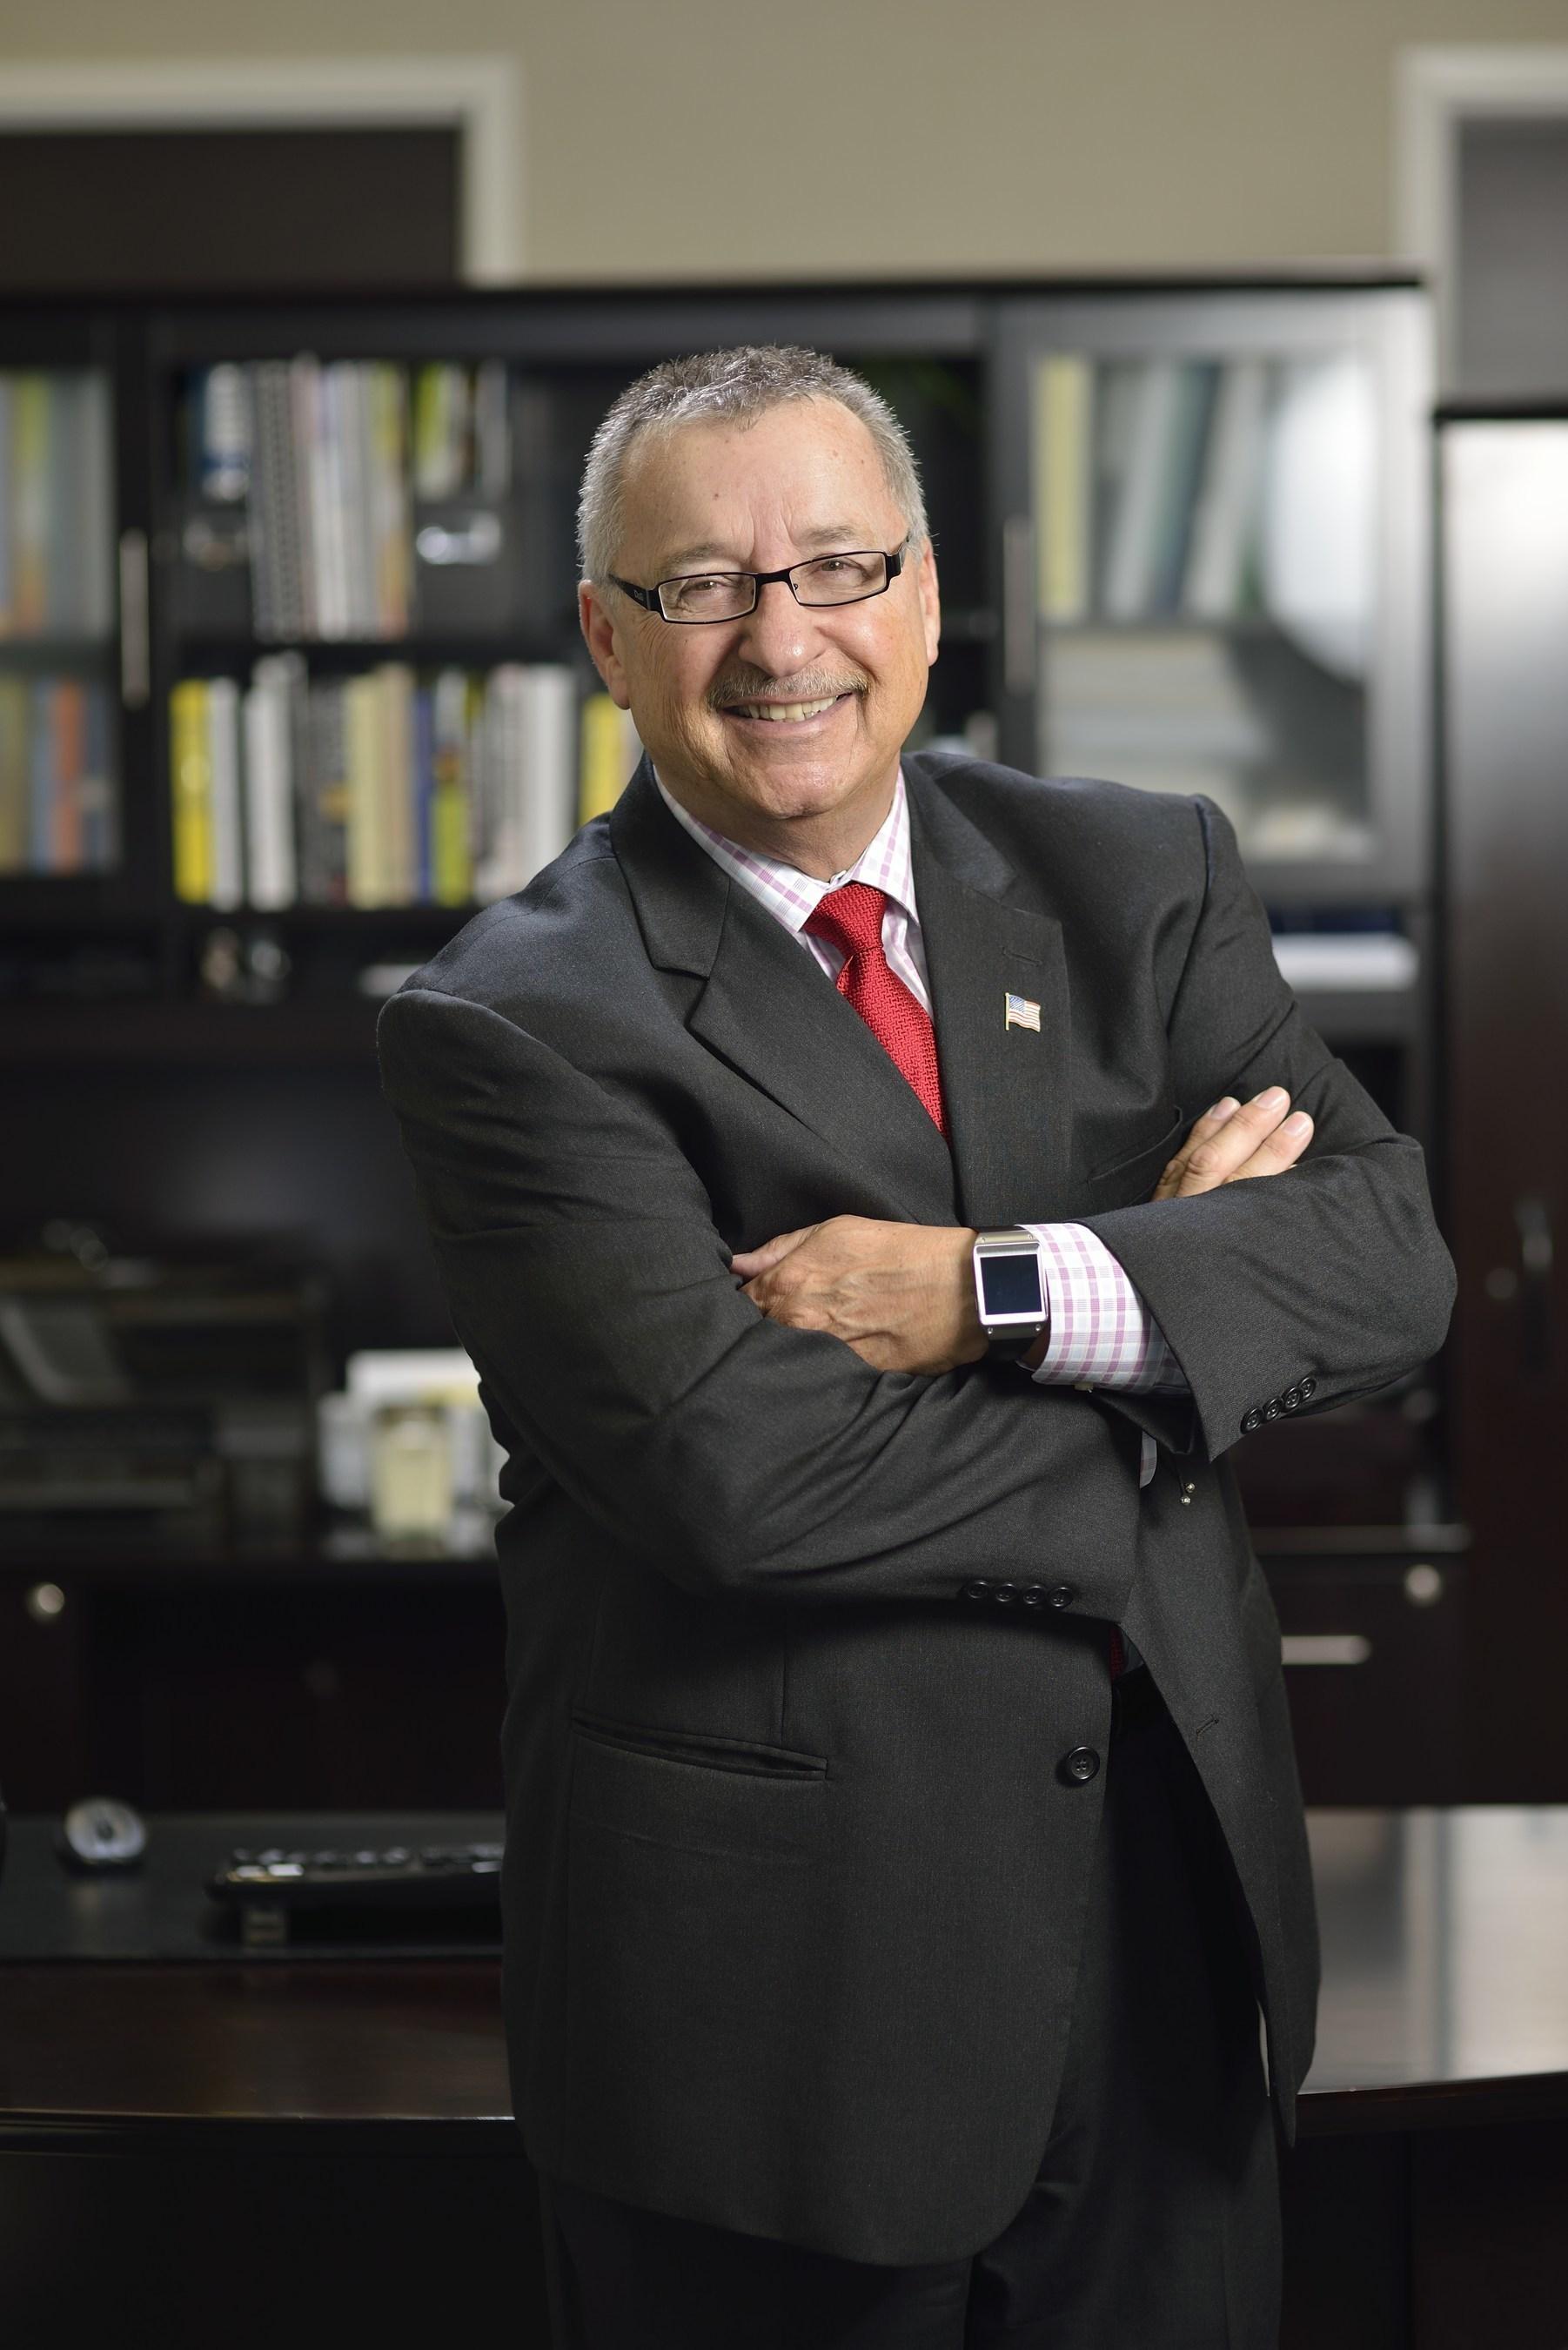 David Ruggieri, Florida Technical College President